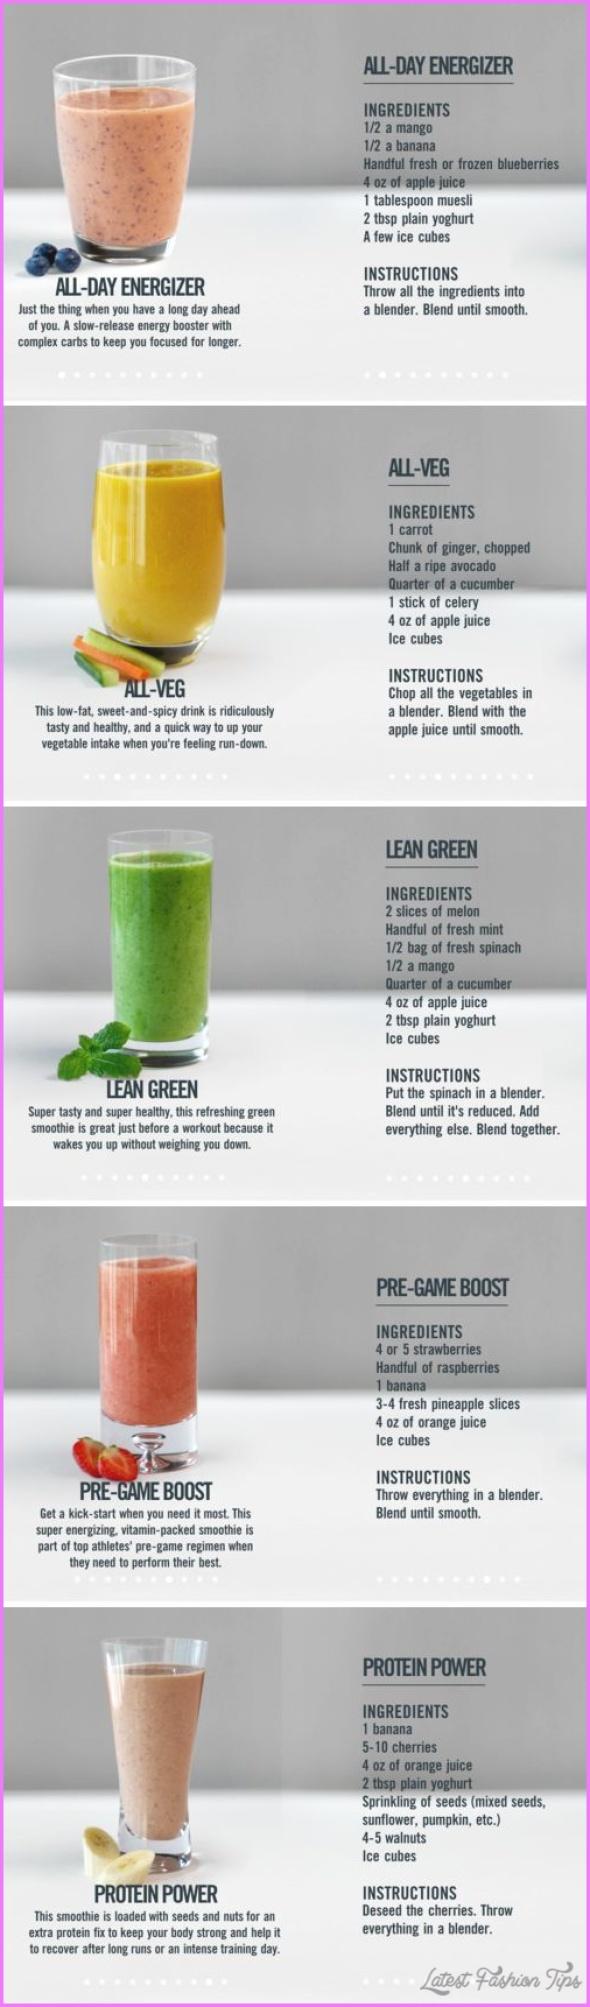 Ninja Blender Recipes To Lose Weight_9.jpg